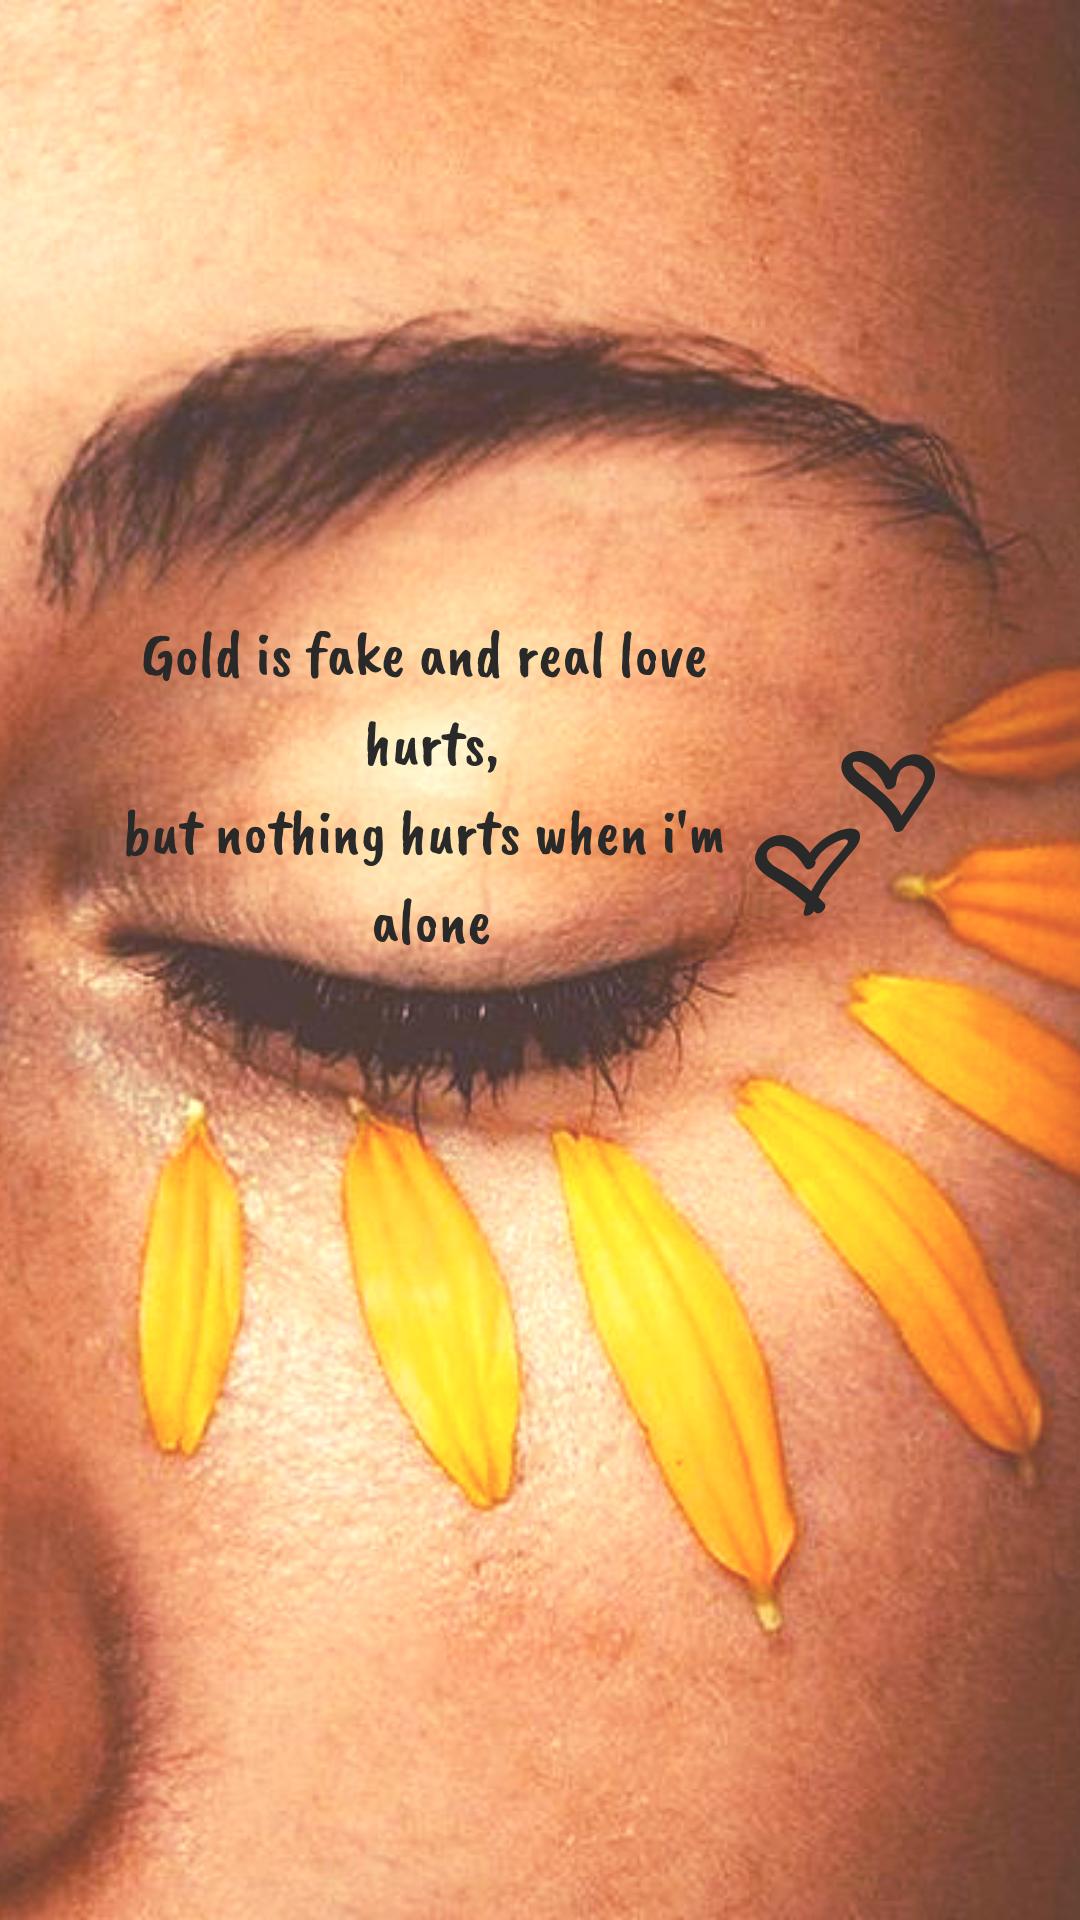 Billie Eilish Aesthetic Yellow Love Quote Wallpaper Iphone